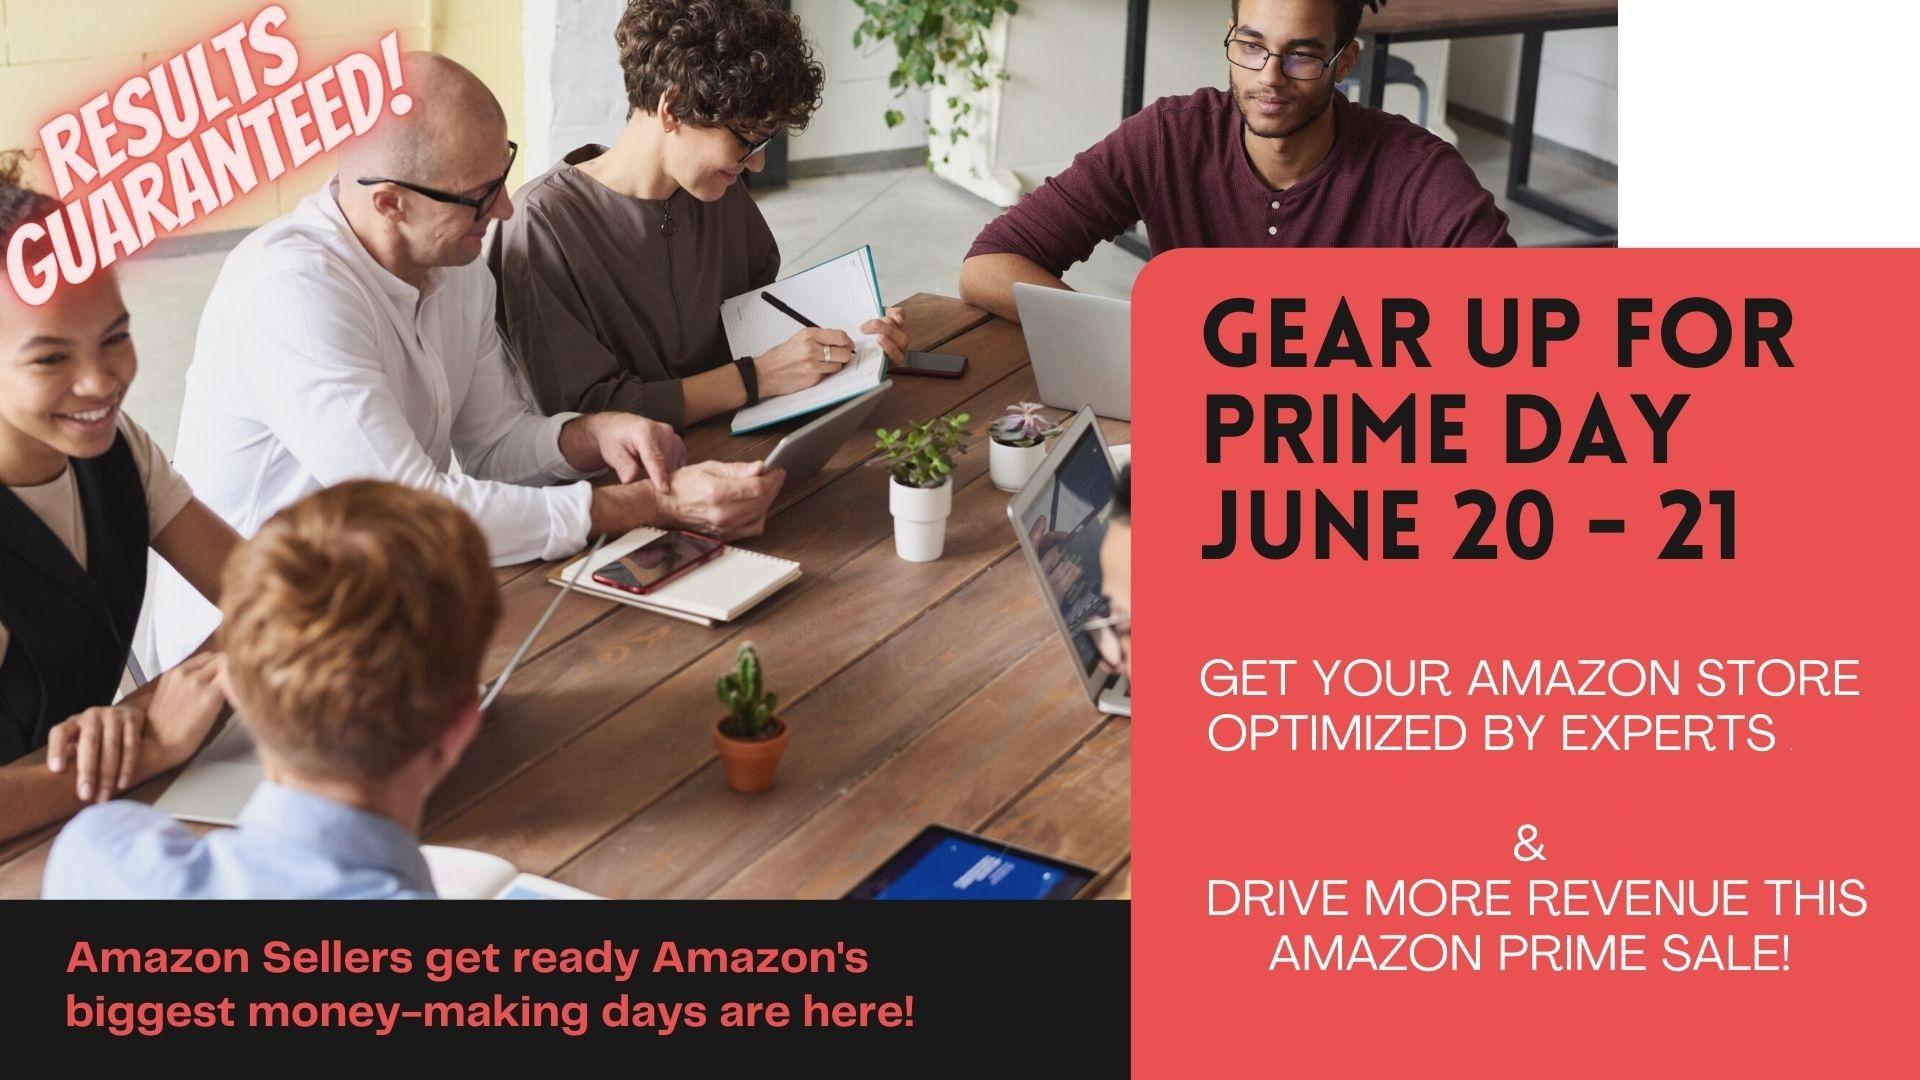 Drive More Revenue This Prime Day 2021 With Amazon Listing Optimization - SunTecIndia.net